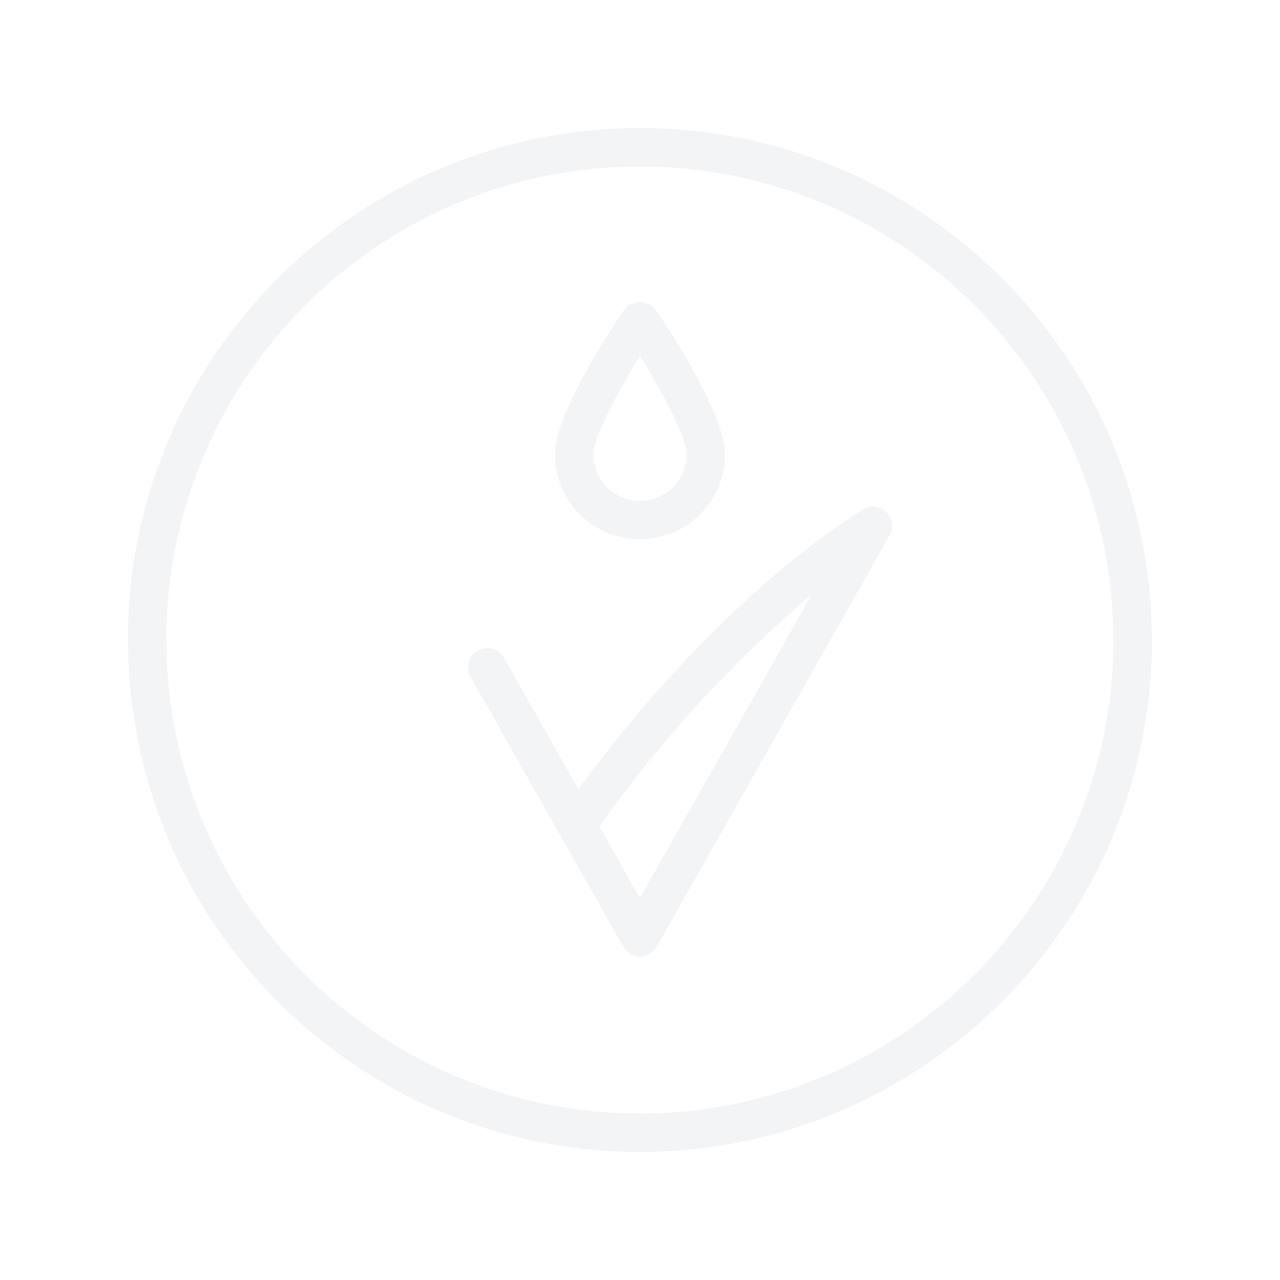 Dr. Hauschka Revitalising Hair & Scalp Tonic 100ml